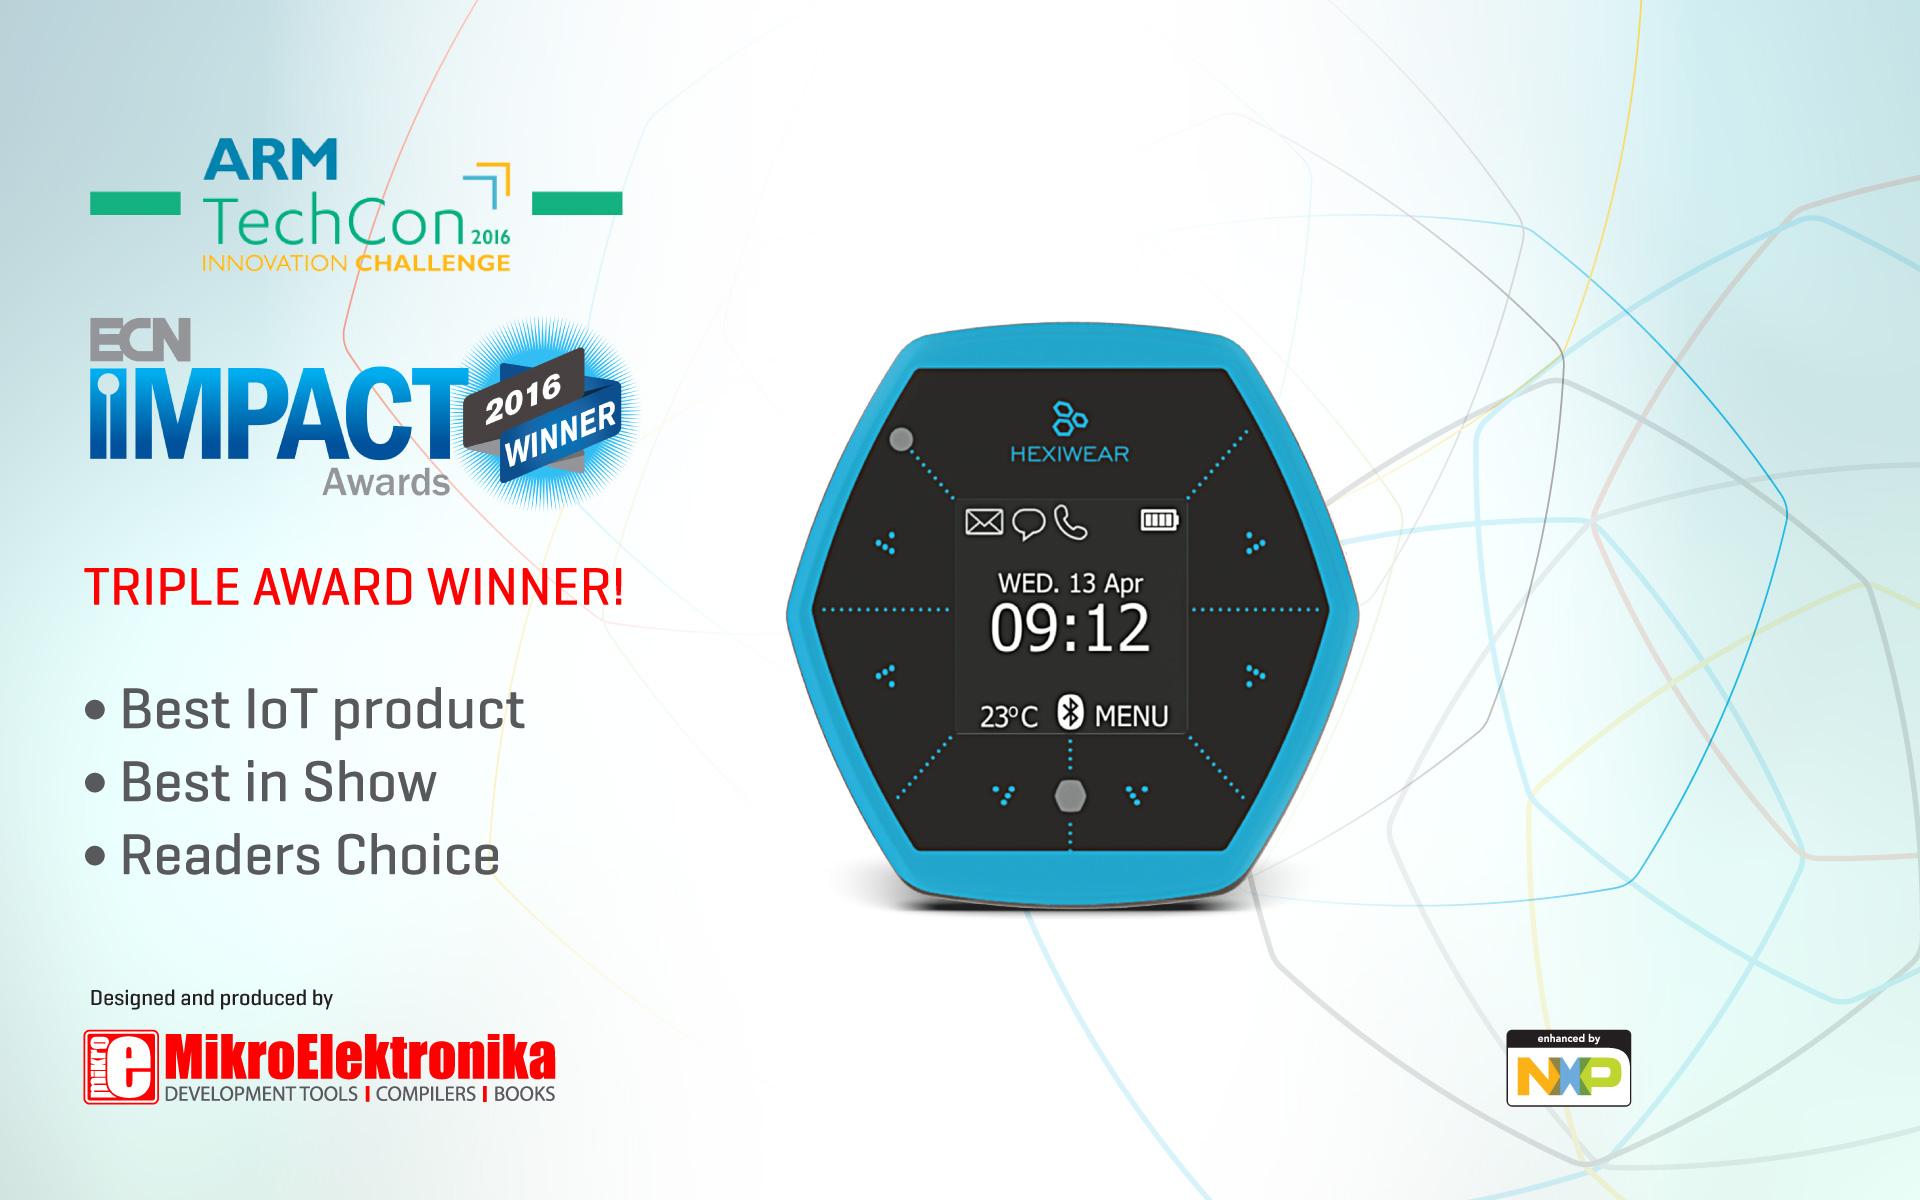 Hexiwear dominates ARM TechCon 2016 Innovation challenge winning three awards!